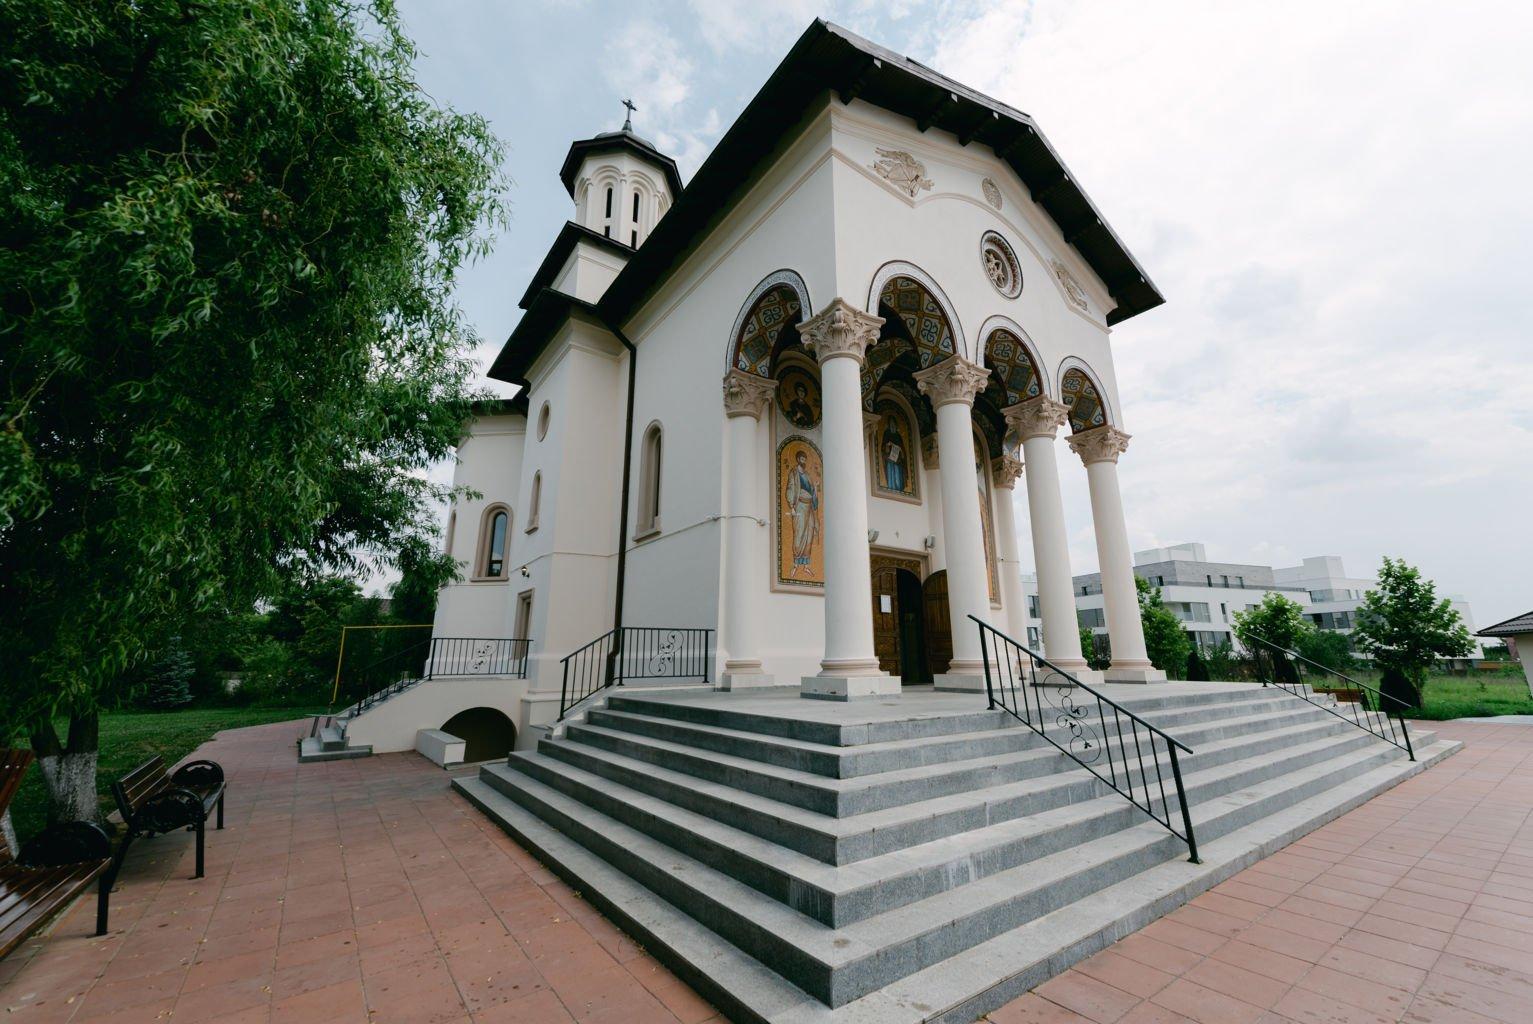 fotografii detalii botez biserica Sf. Antonie Maicaneasa Bucuresti